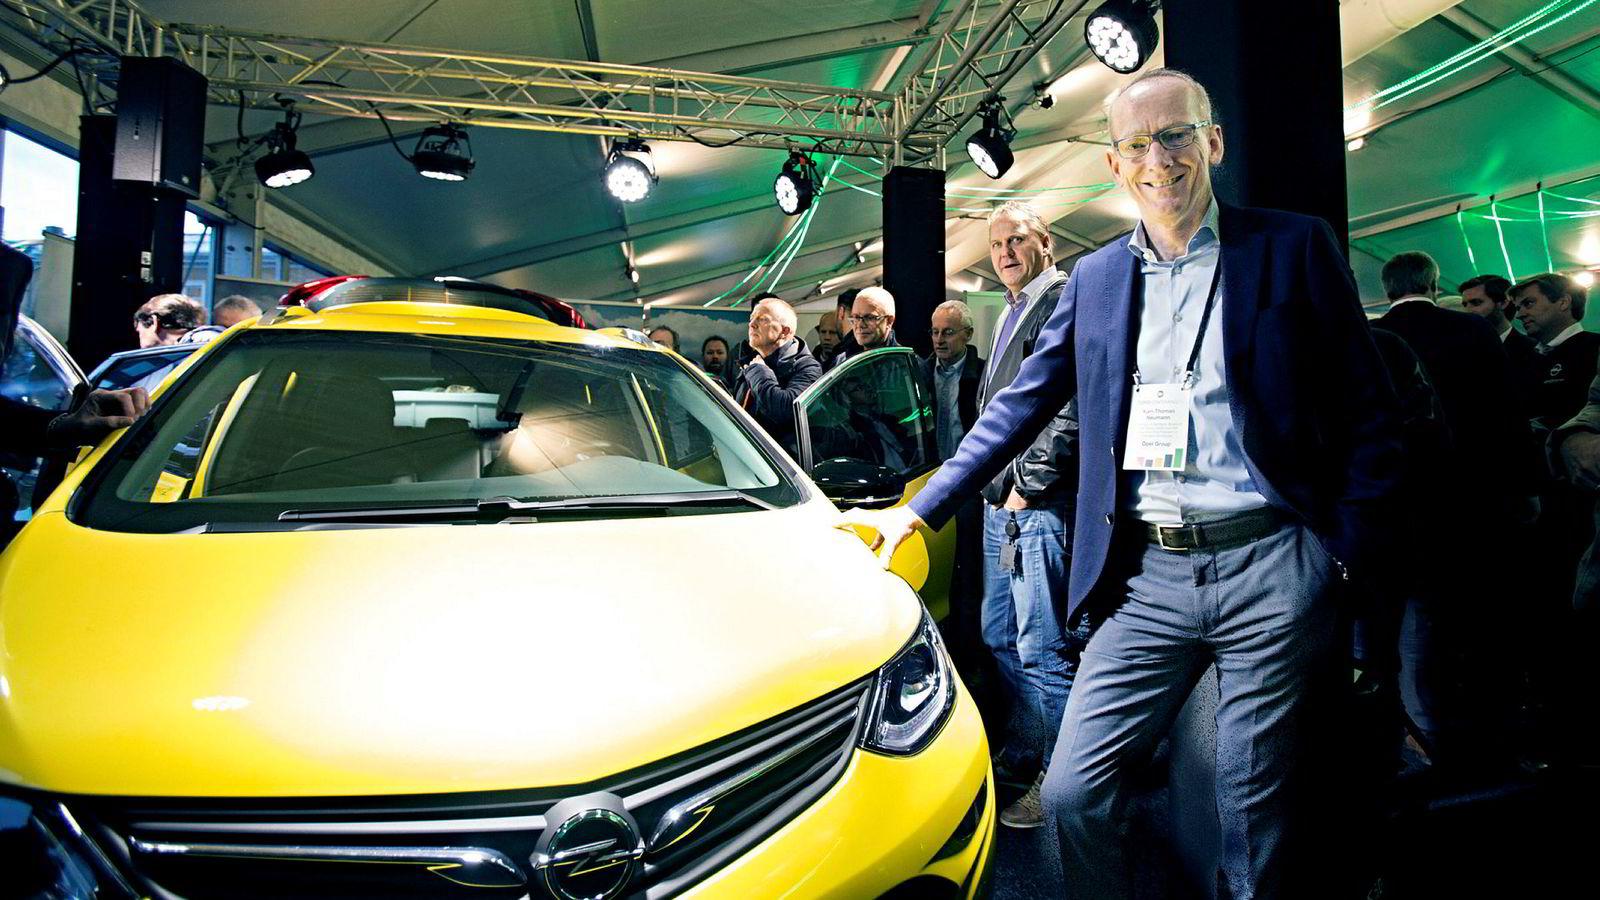 Opel-sjef Karl-Thomas Neumann presenterte Ampera, Opel nye el-bil, i årets Zero-konferanse.